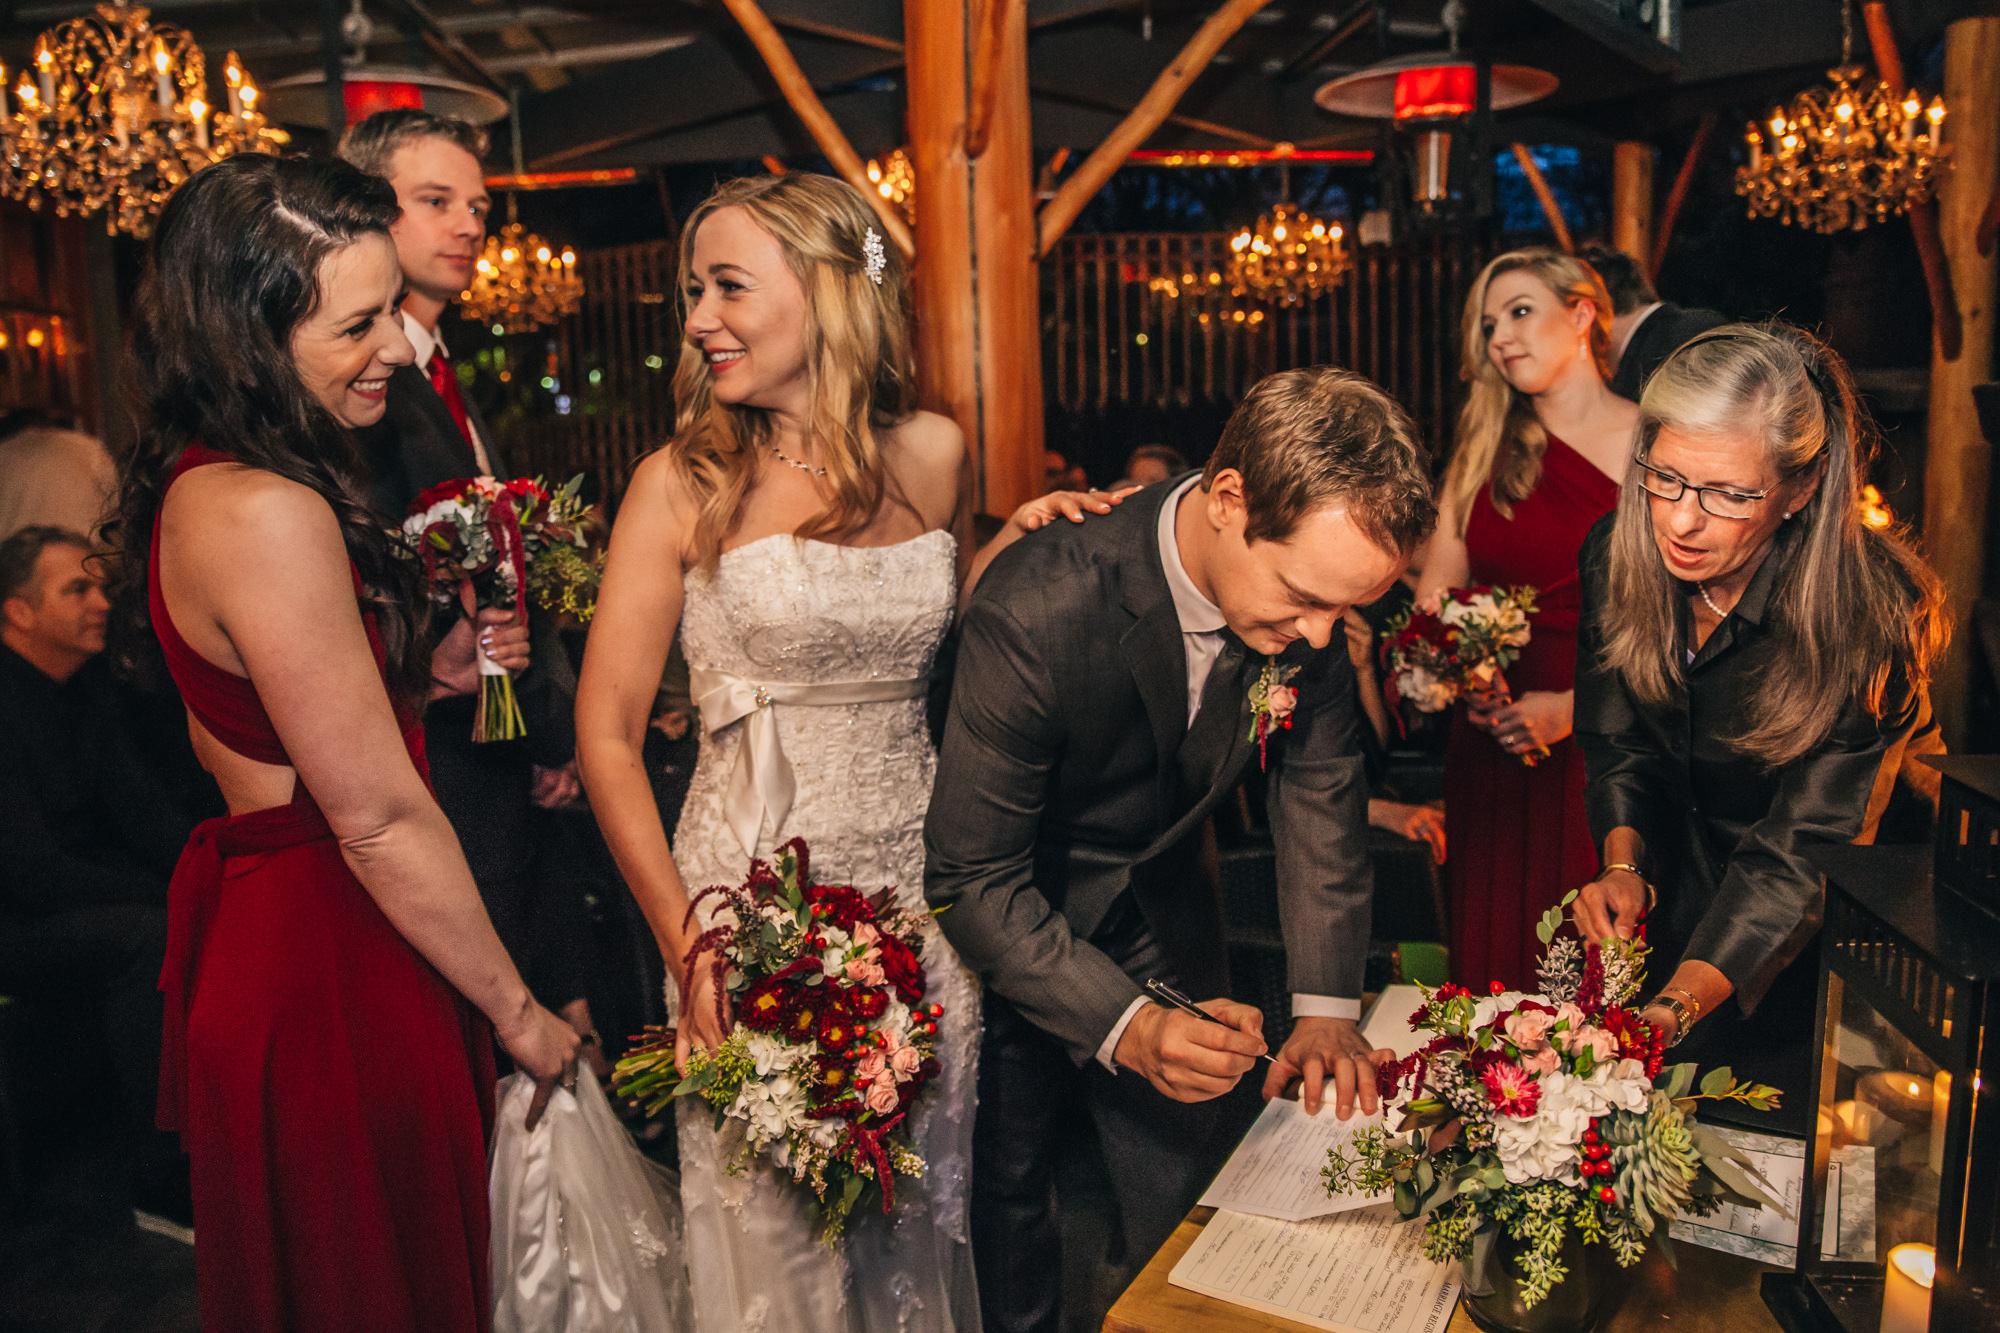 40-seasons-in-the-park-wedding-signing.jpg